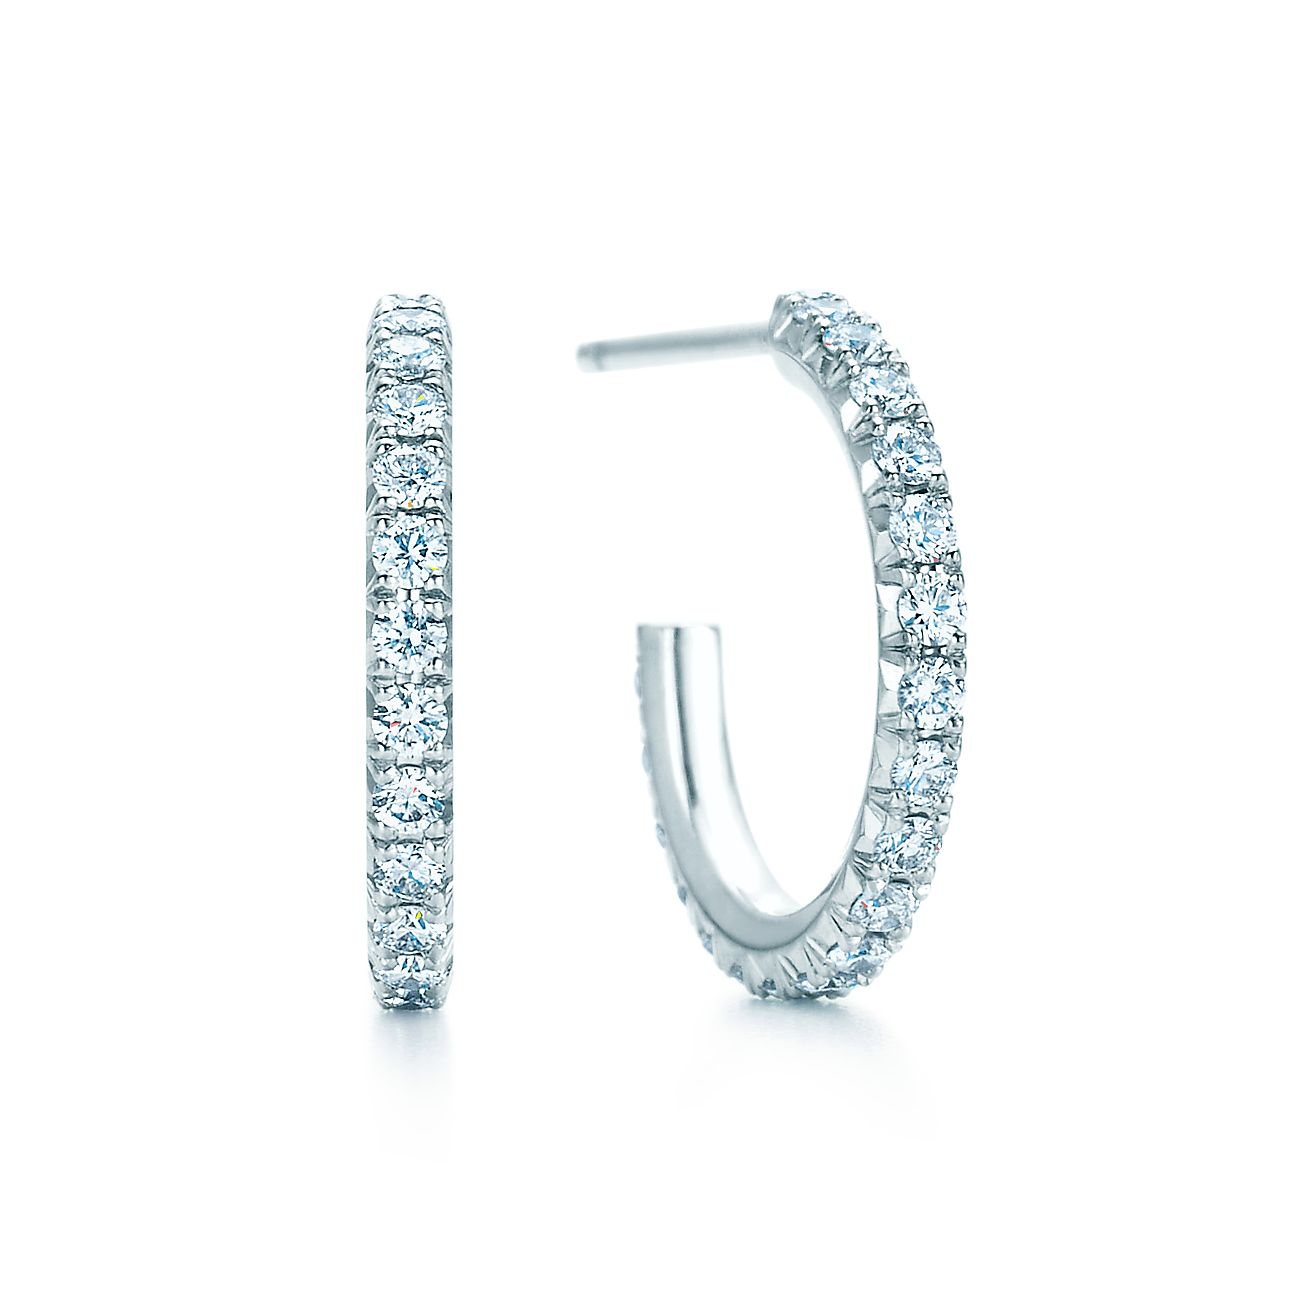 tiffany metro hoop earrings in 18k white gold with